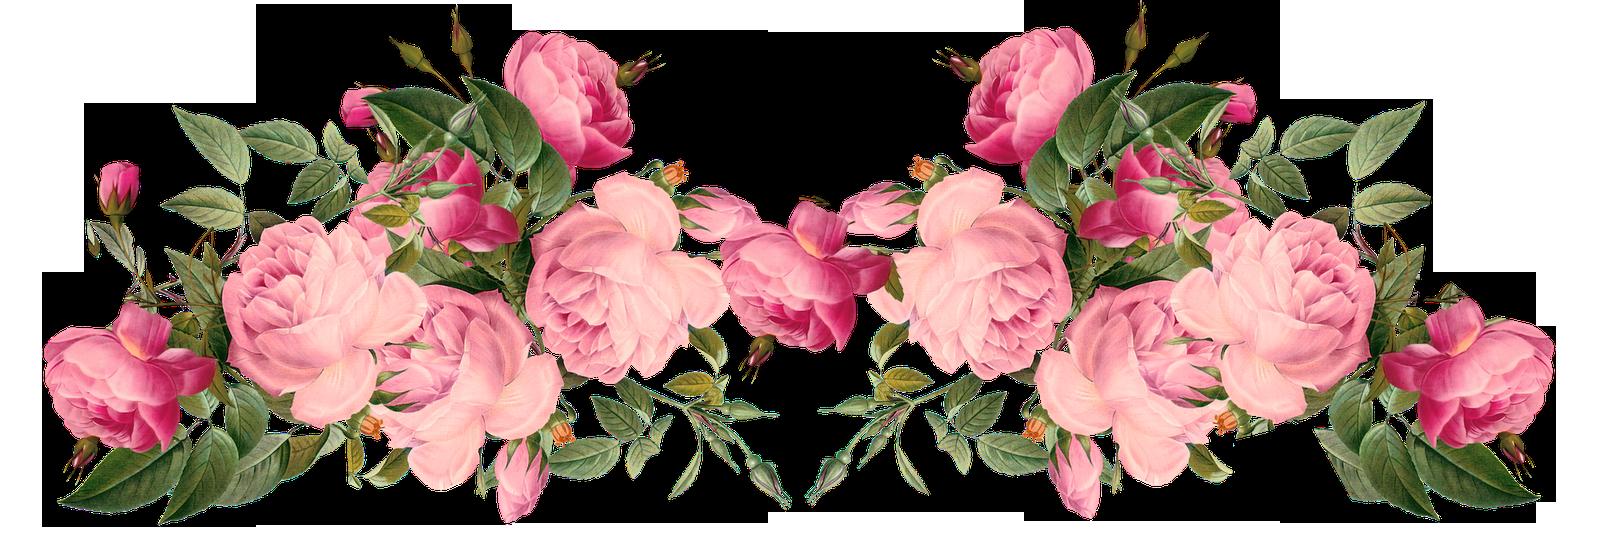 Flowers Borders PNG - 15485